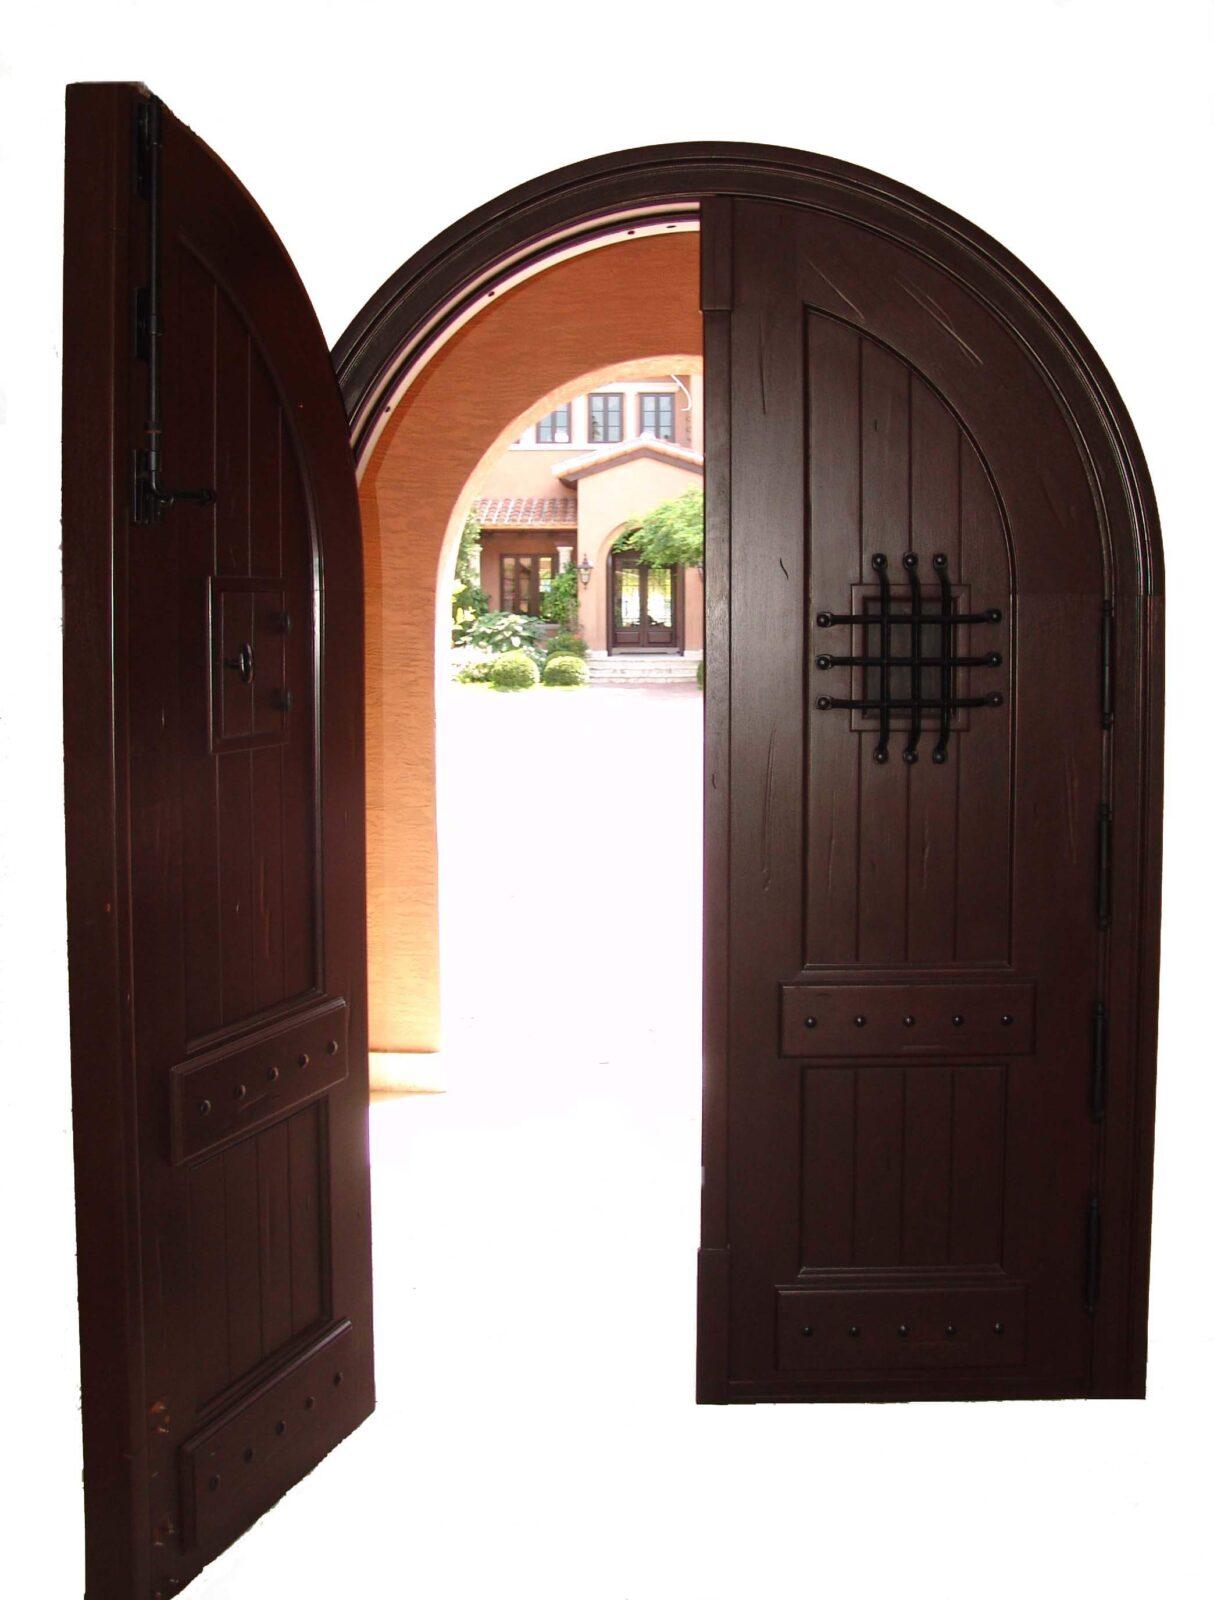 PALM ISLAND DOUBLE MAHOGANY GATE DOORS INTERIOR VIEW.